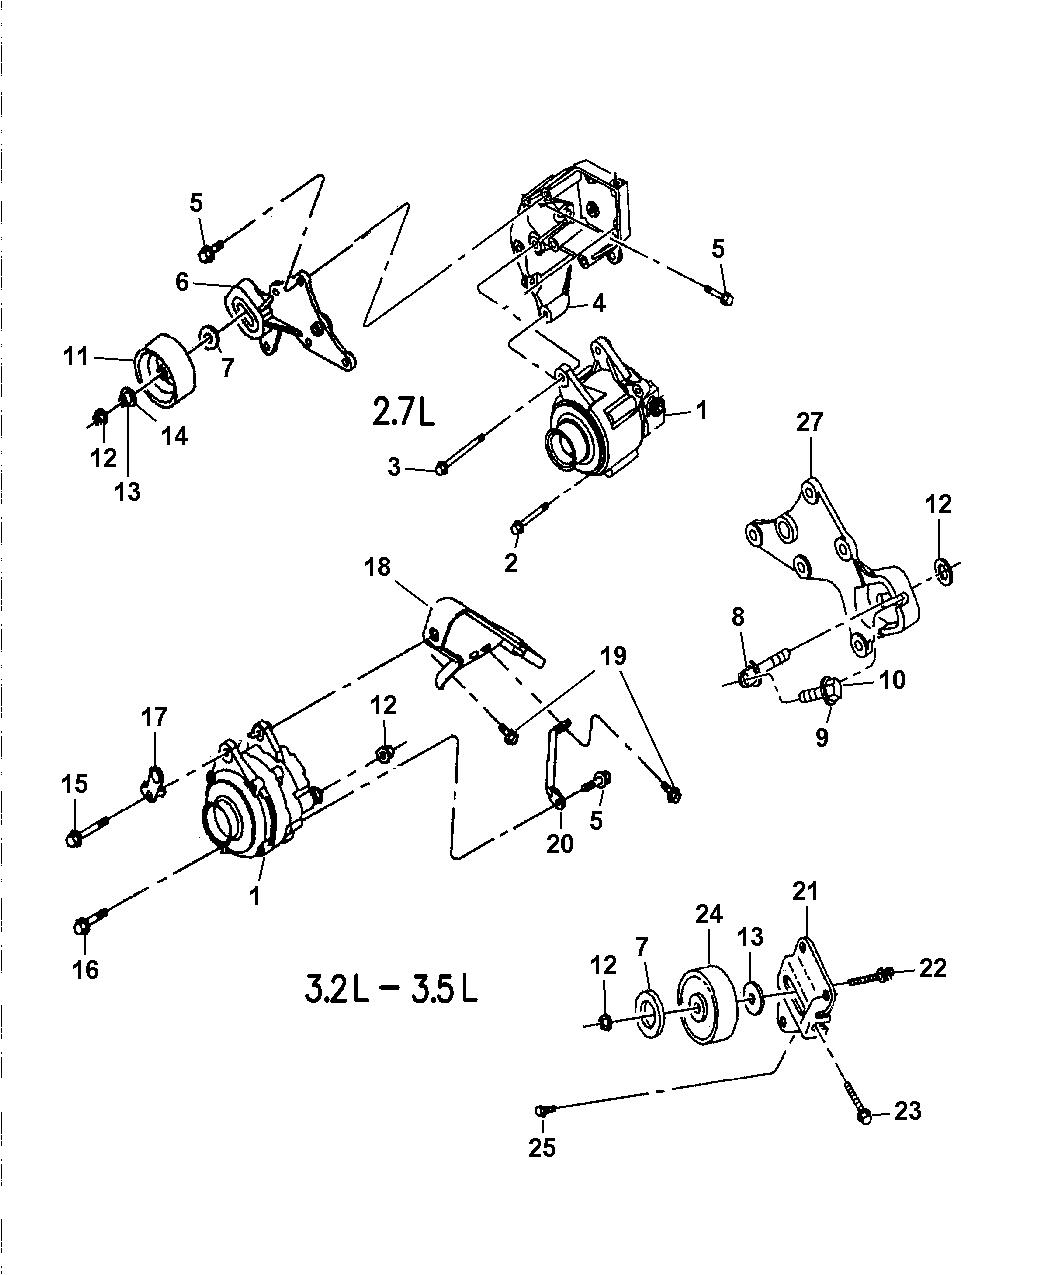 4792112 Genuine Mopar Pulley Idler 3 5l 1997 Engine Diagram 1998 Dodge Intrepid Alternator